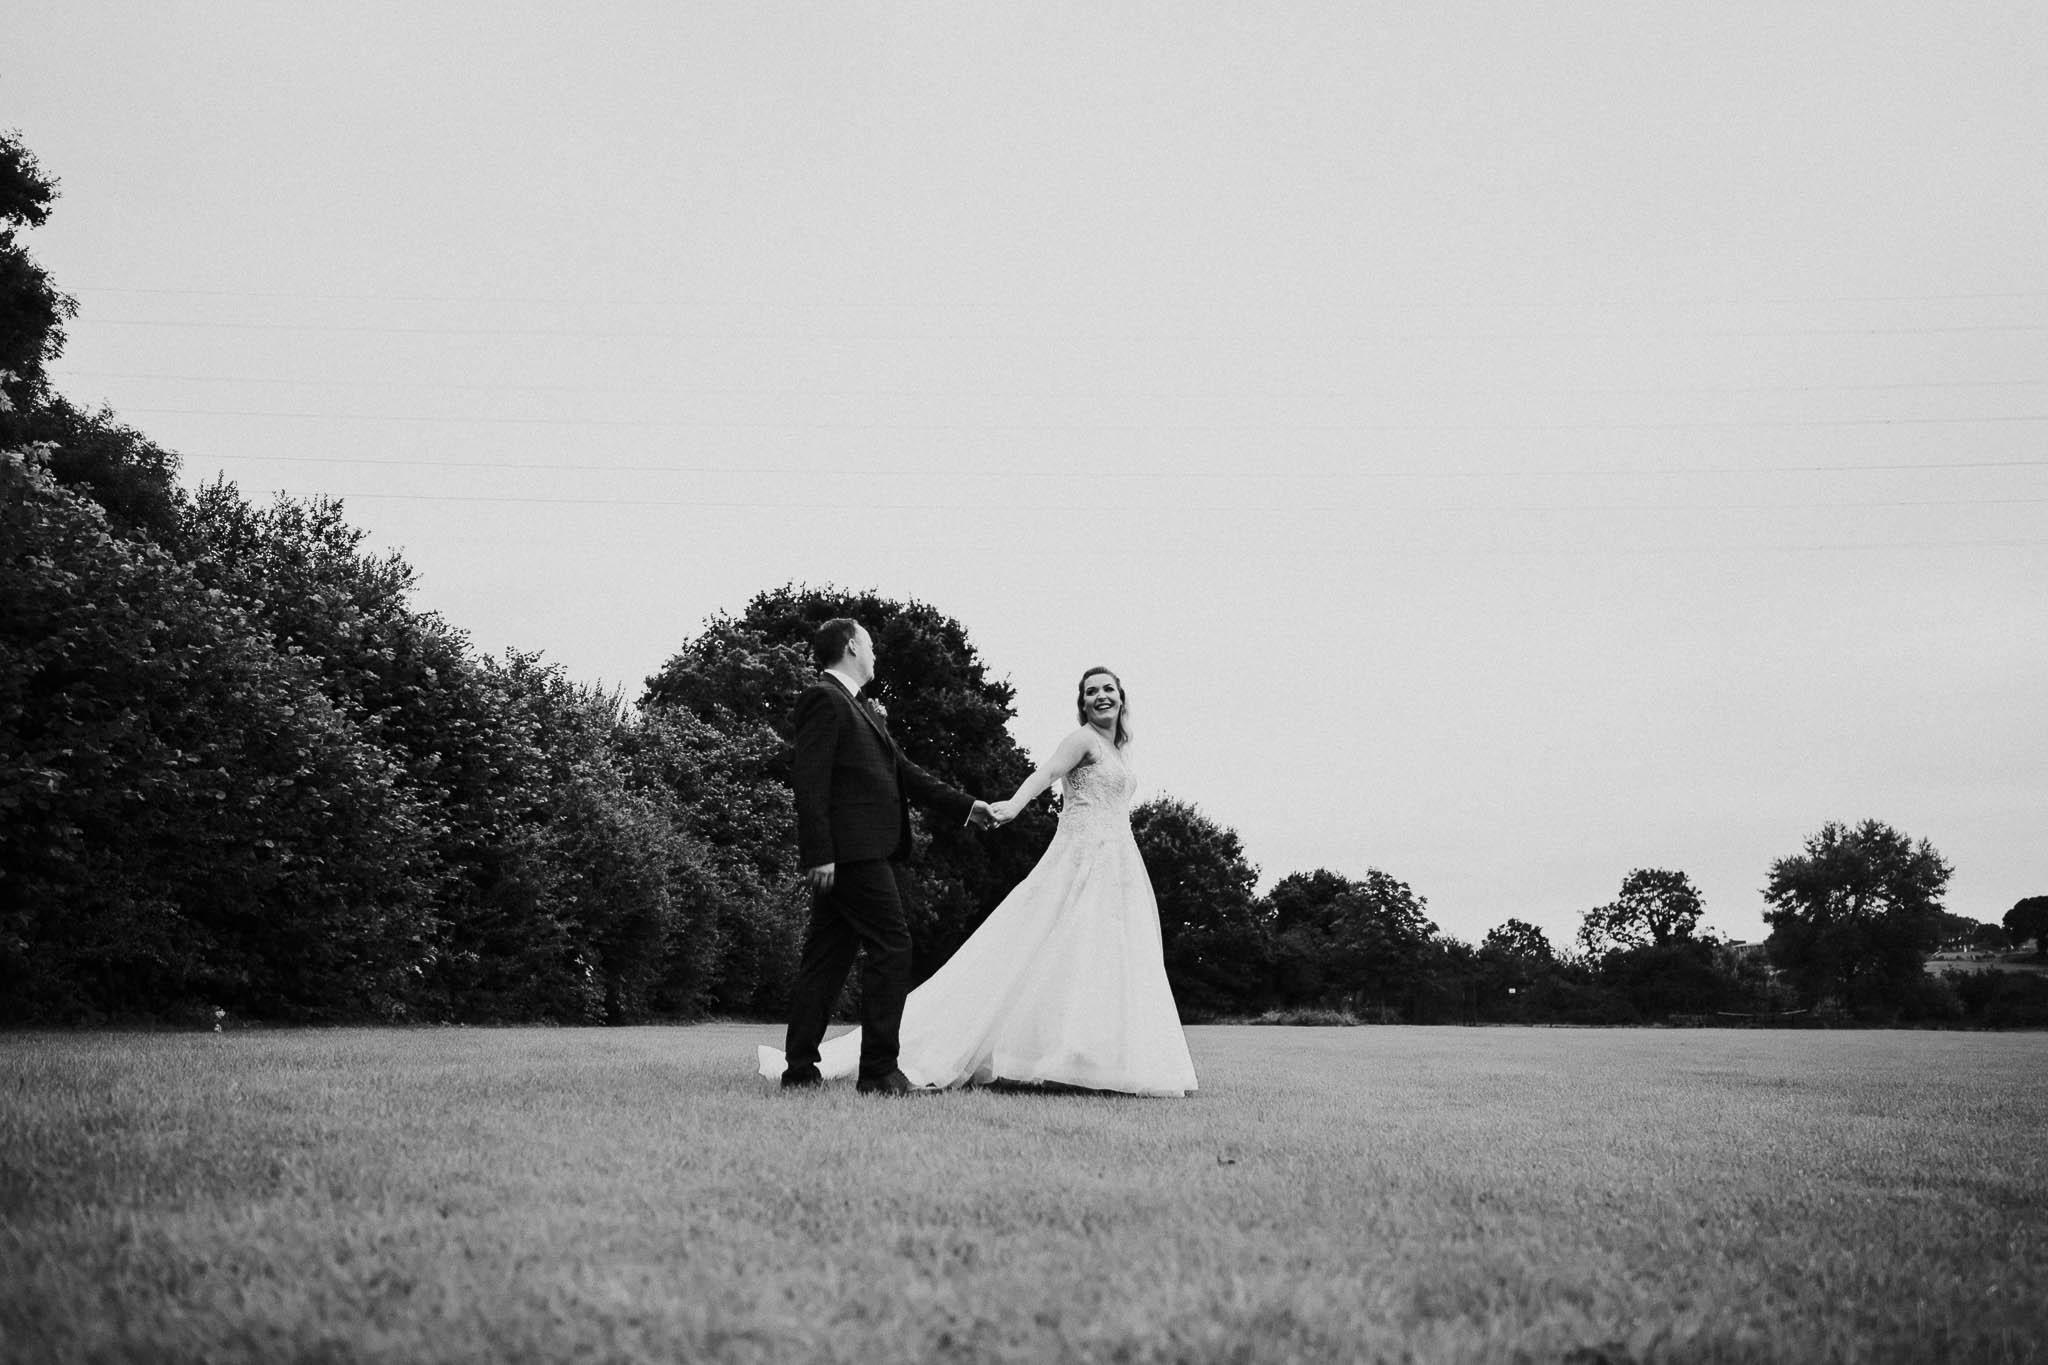 Sussex-Wedding-Photographer-31.jpg